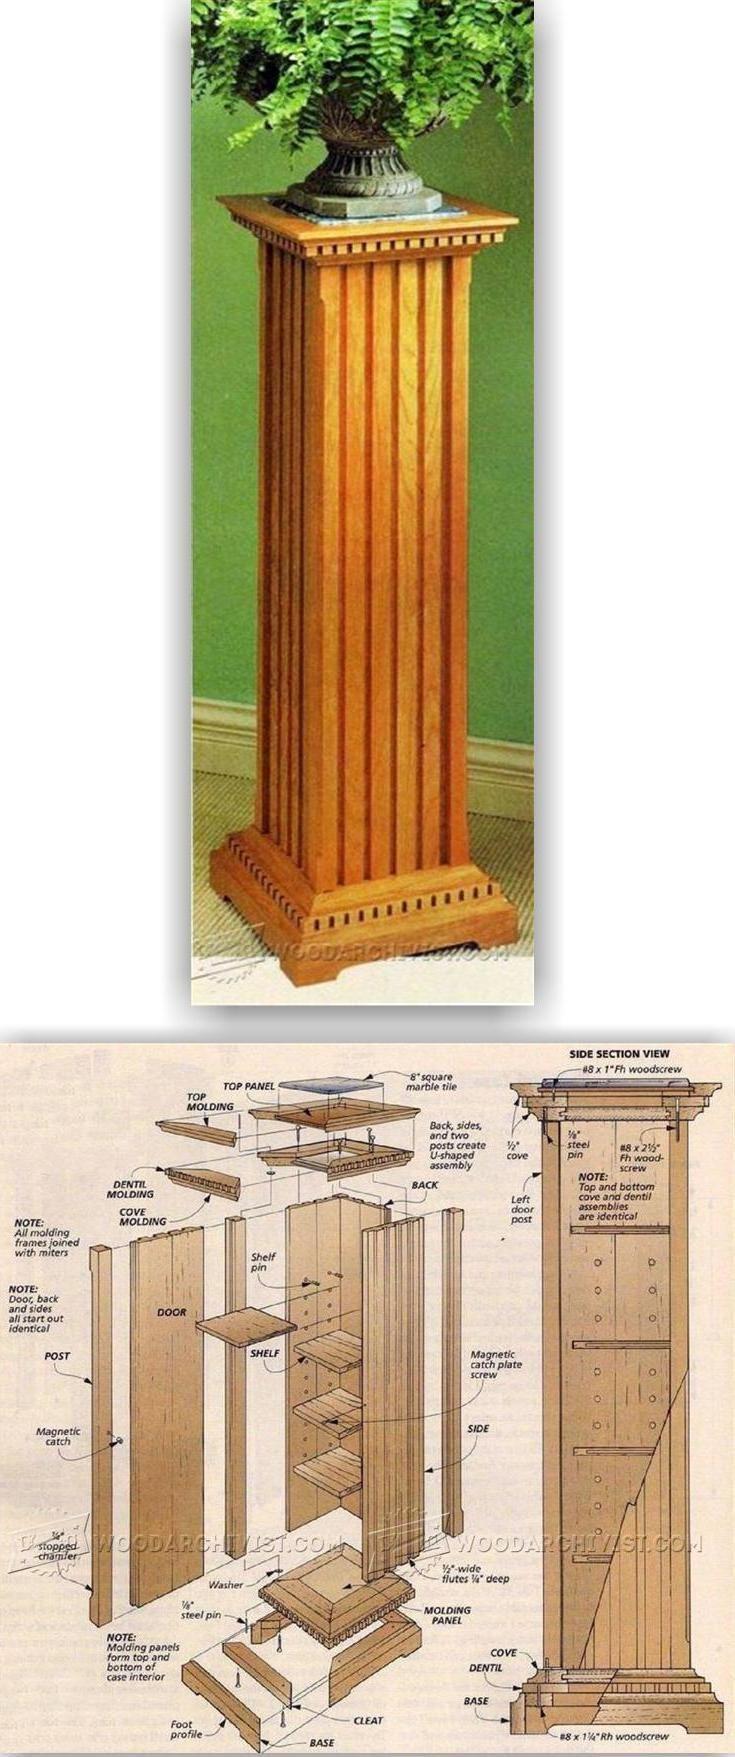 Storage pedestal plans furniture plans and projects for Proyectos de carpinteria pdf